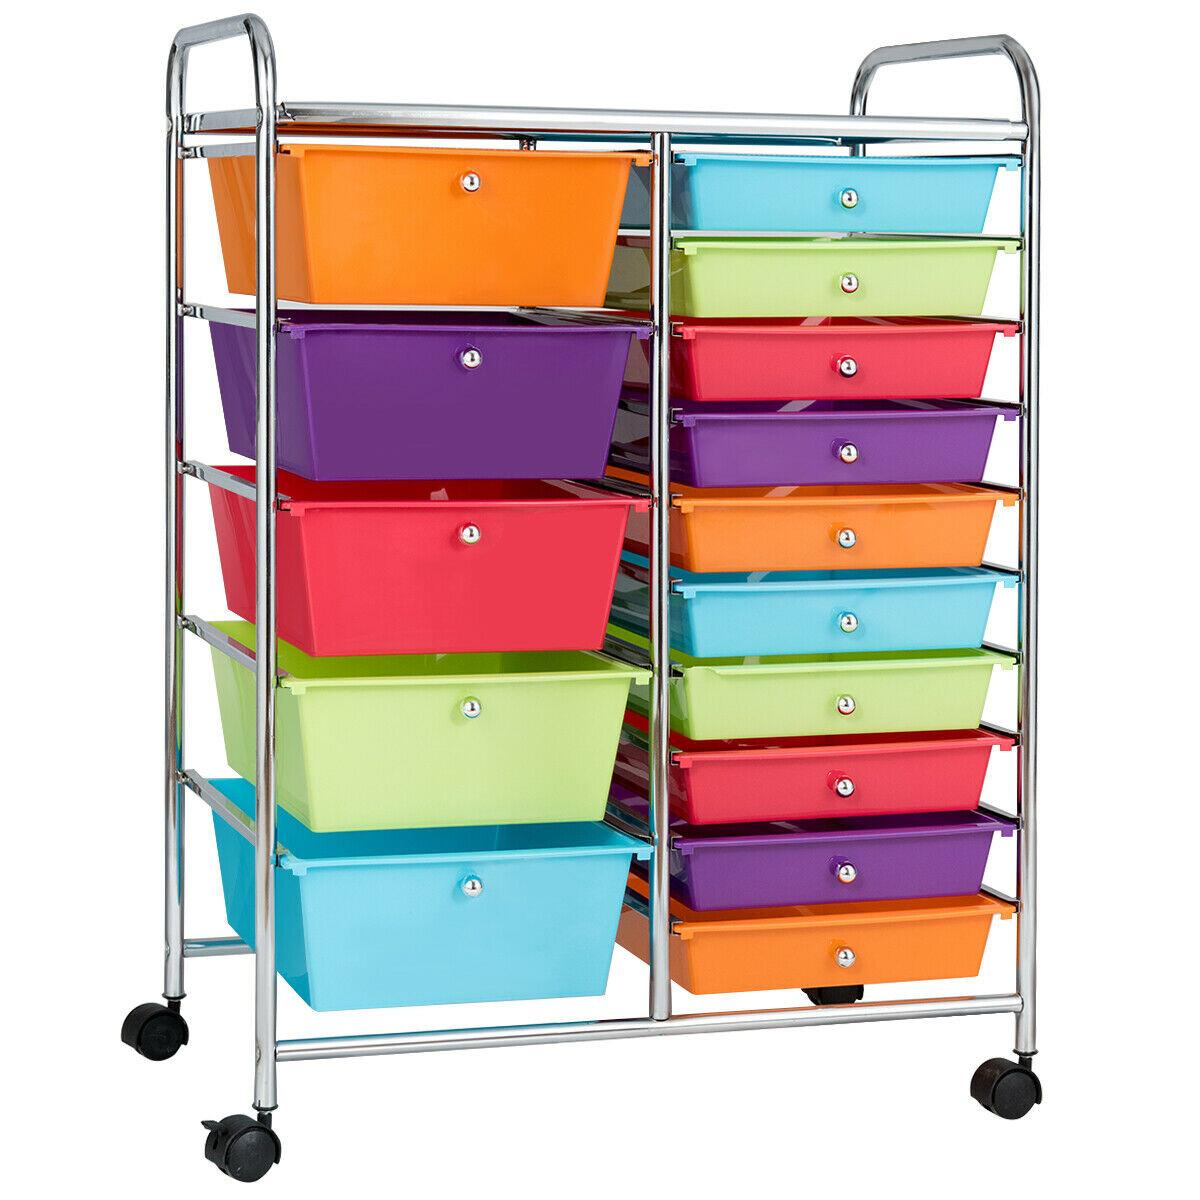 Orange Purple Storage Drawers You Ll Love In 2021 Wayfair